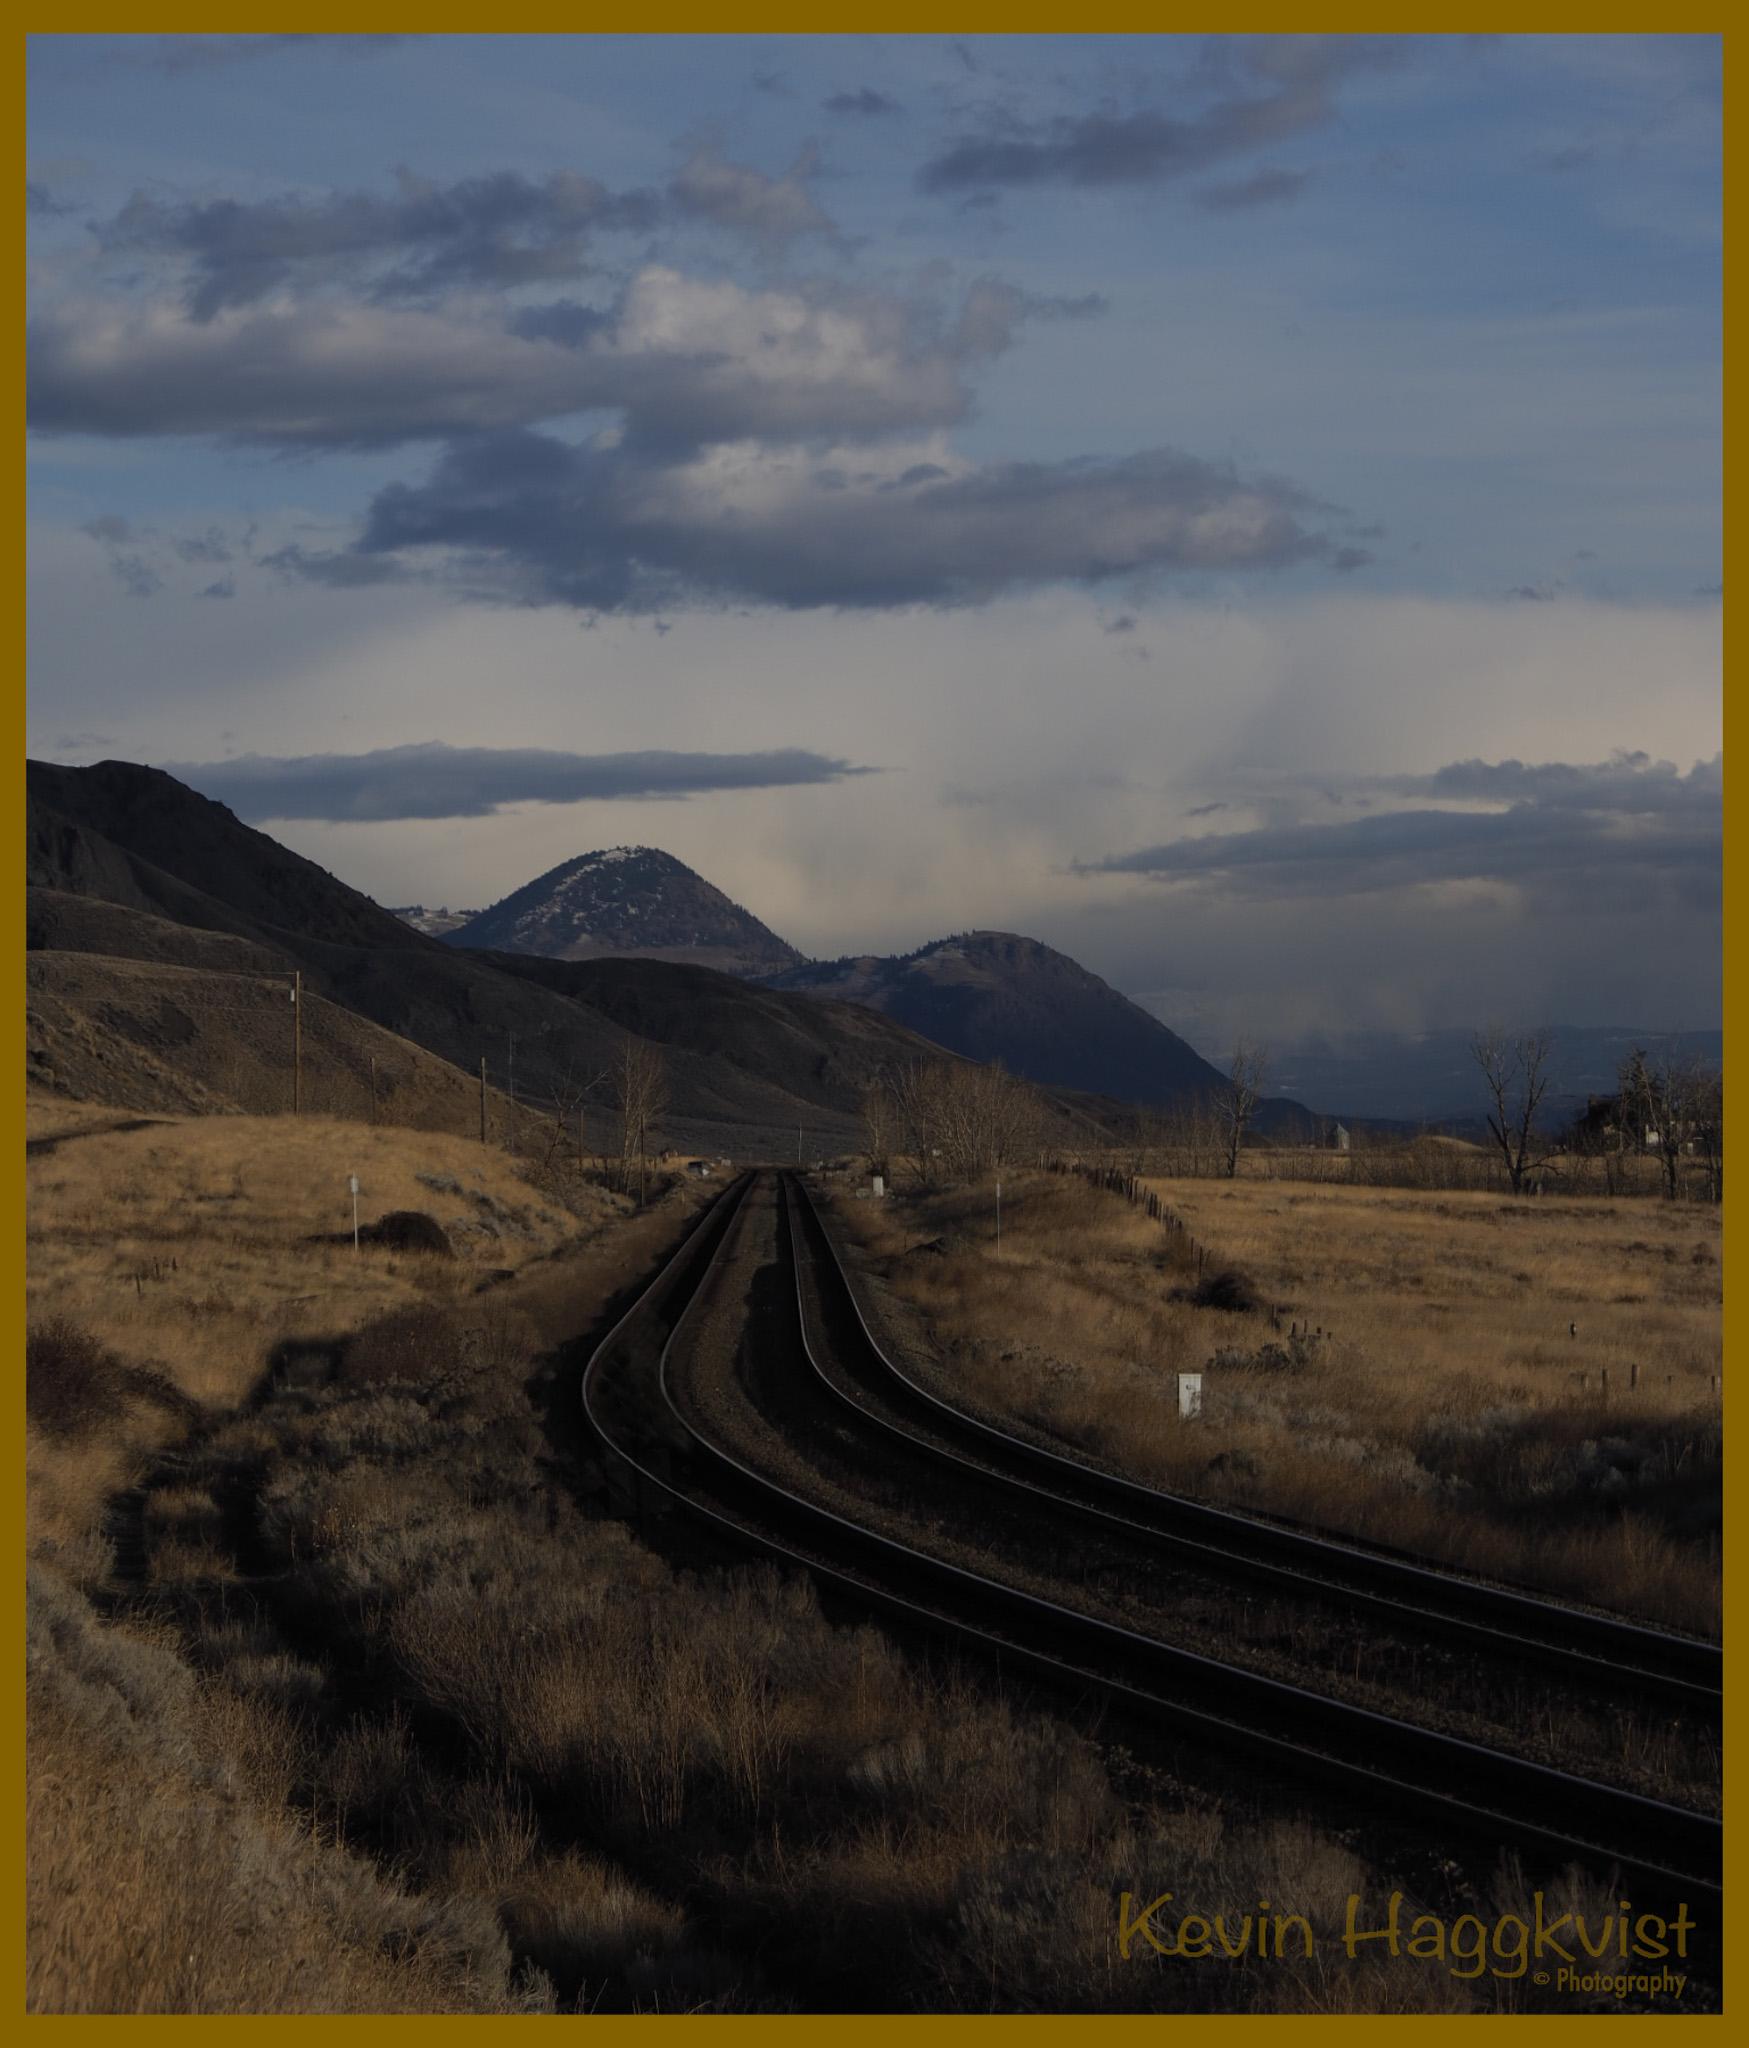 Kevin Haggkvist-Rails To Home